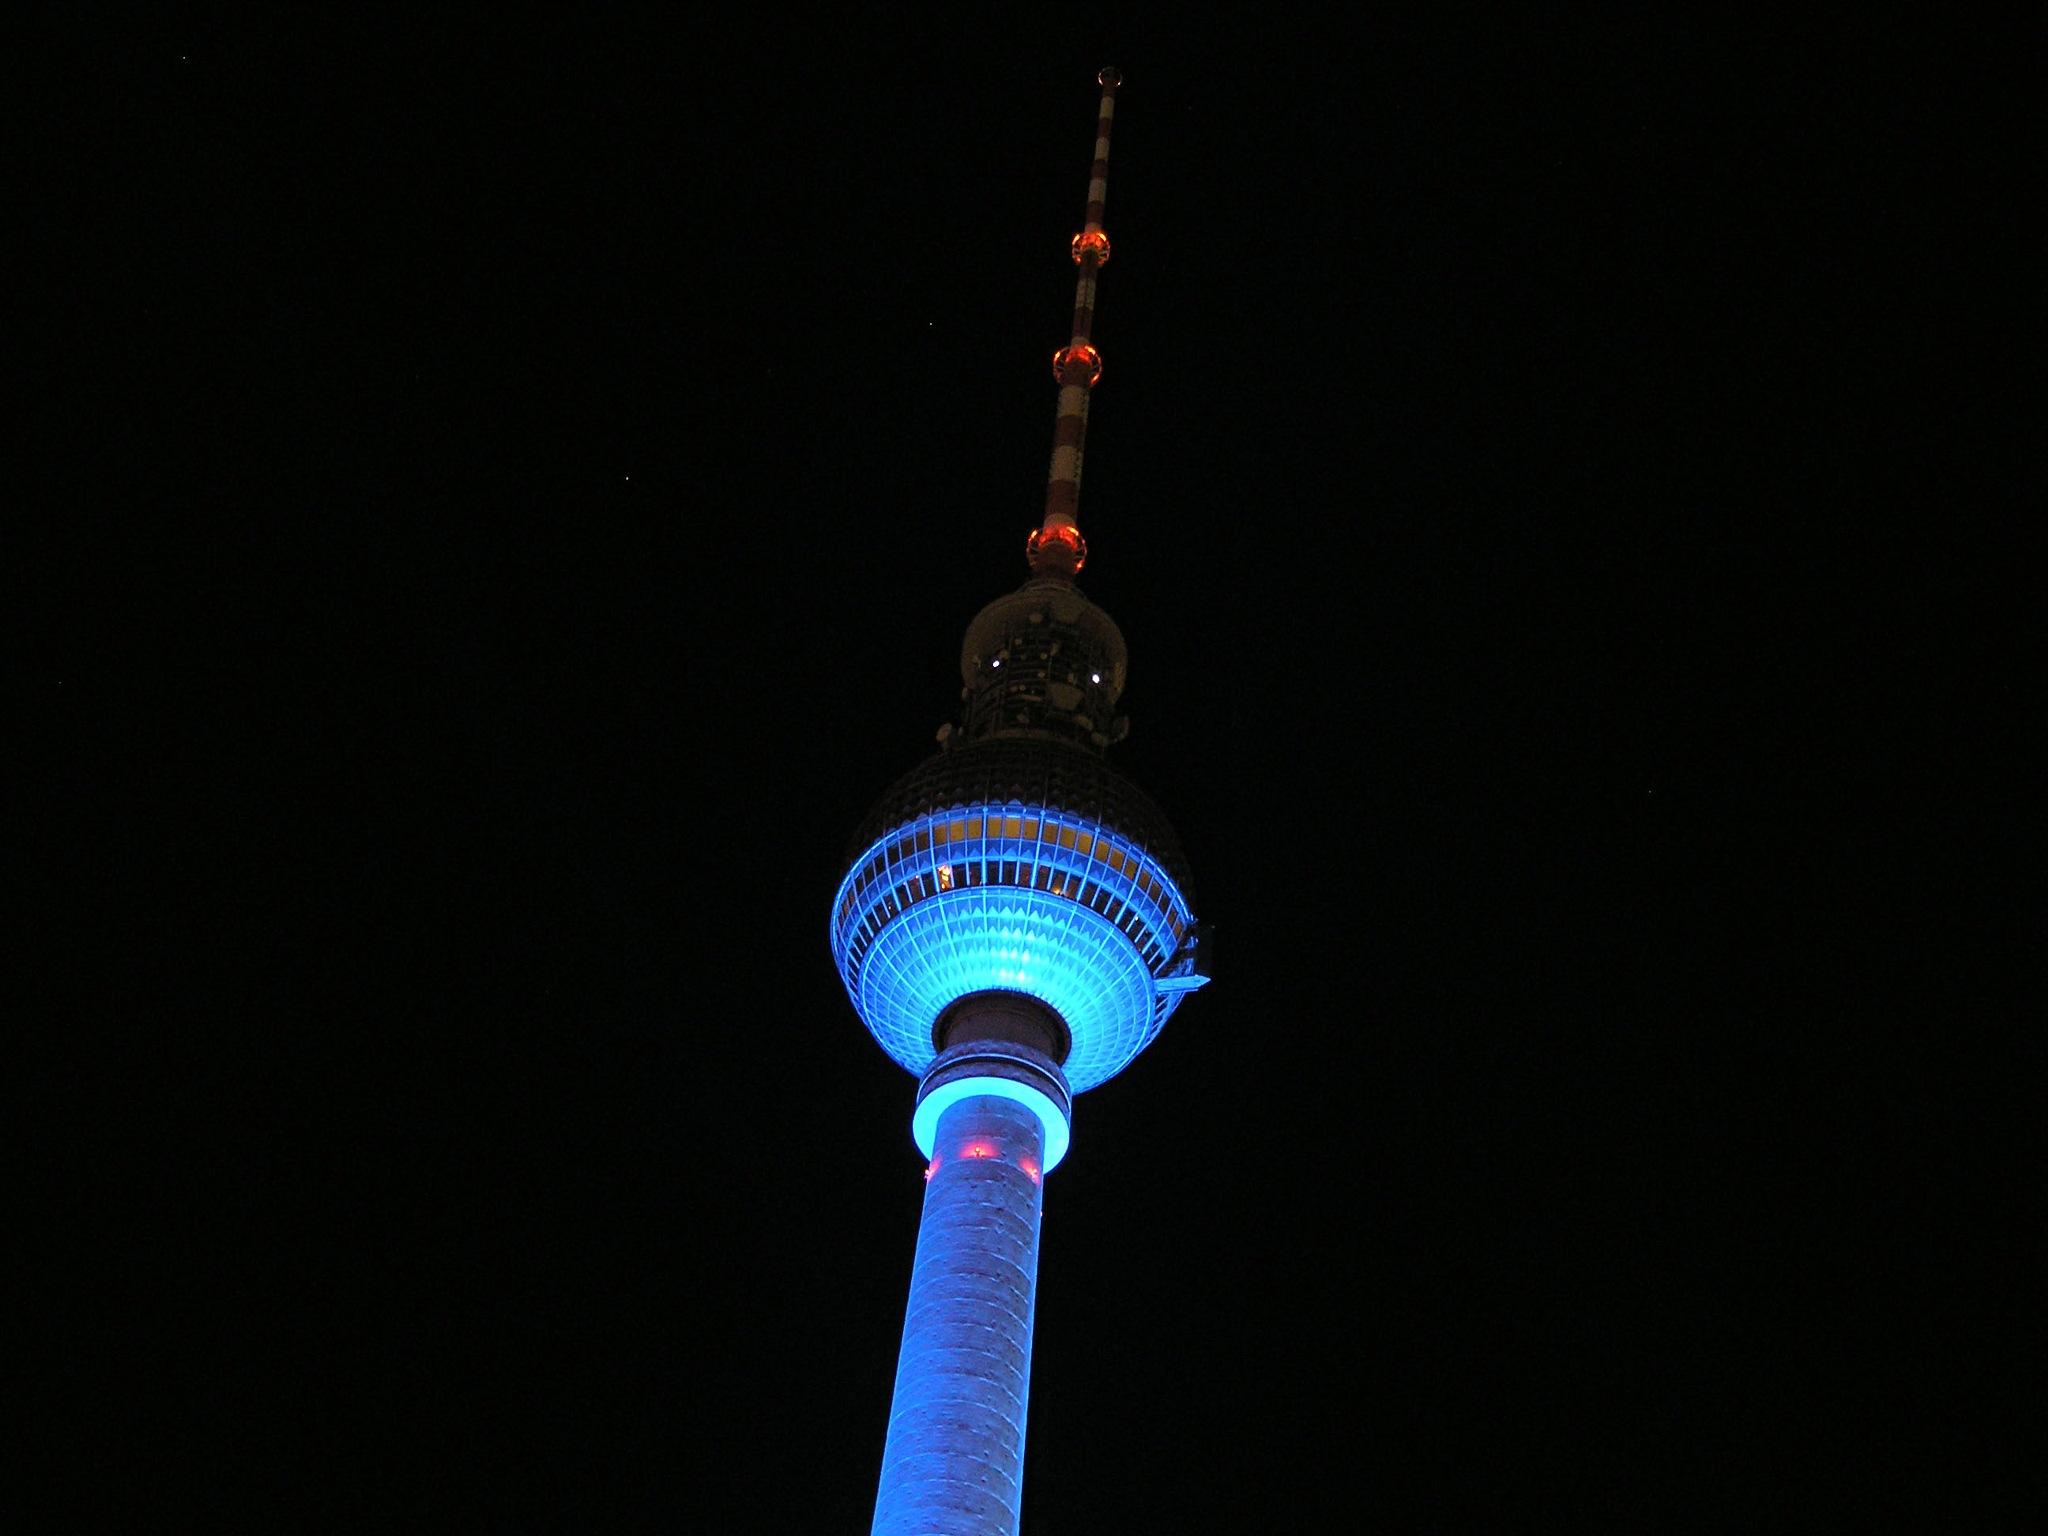 Fernsehturm Alexanderplatz by inge.kanakarisW